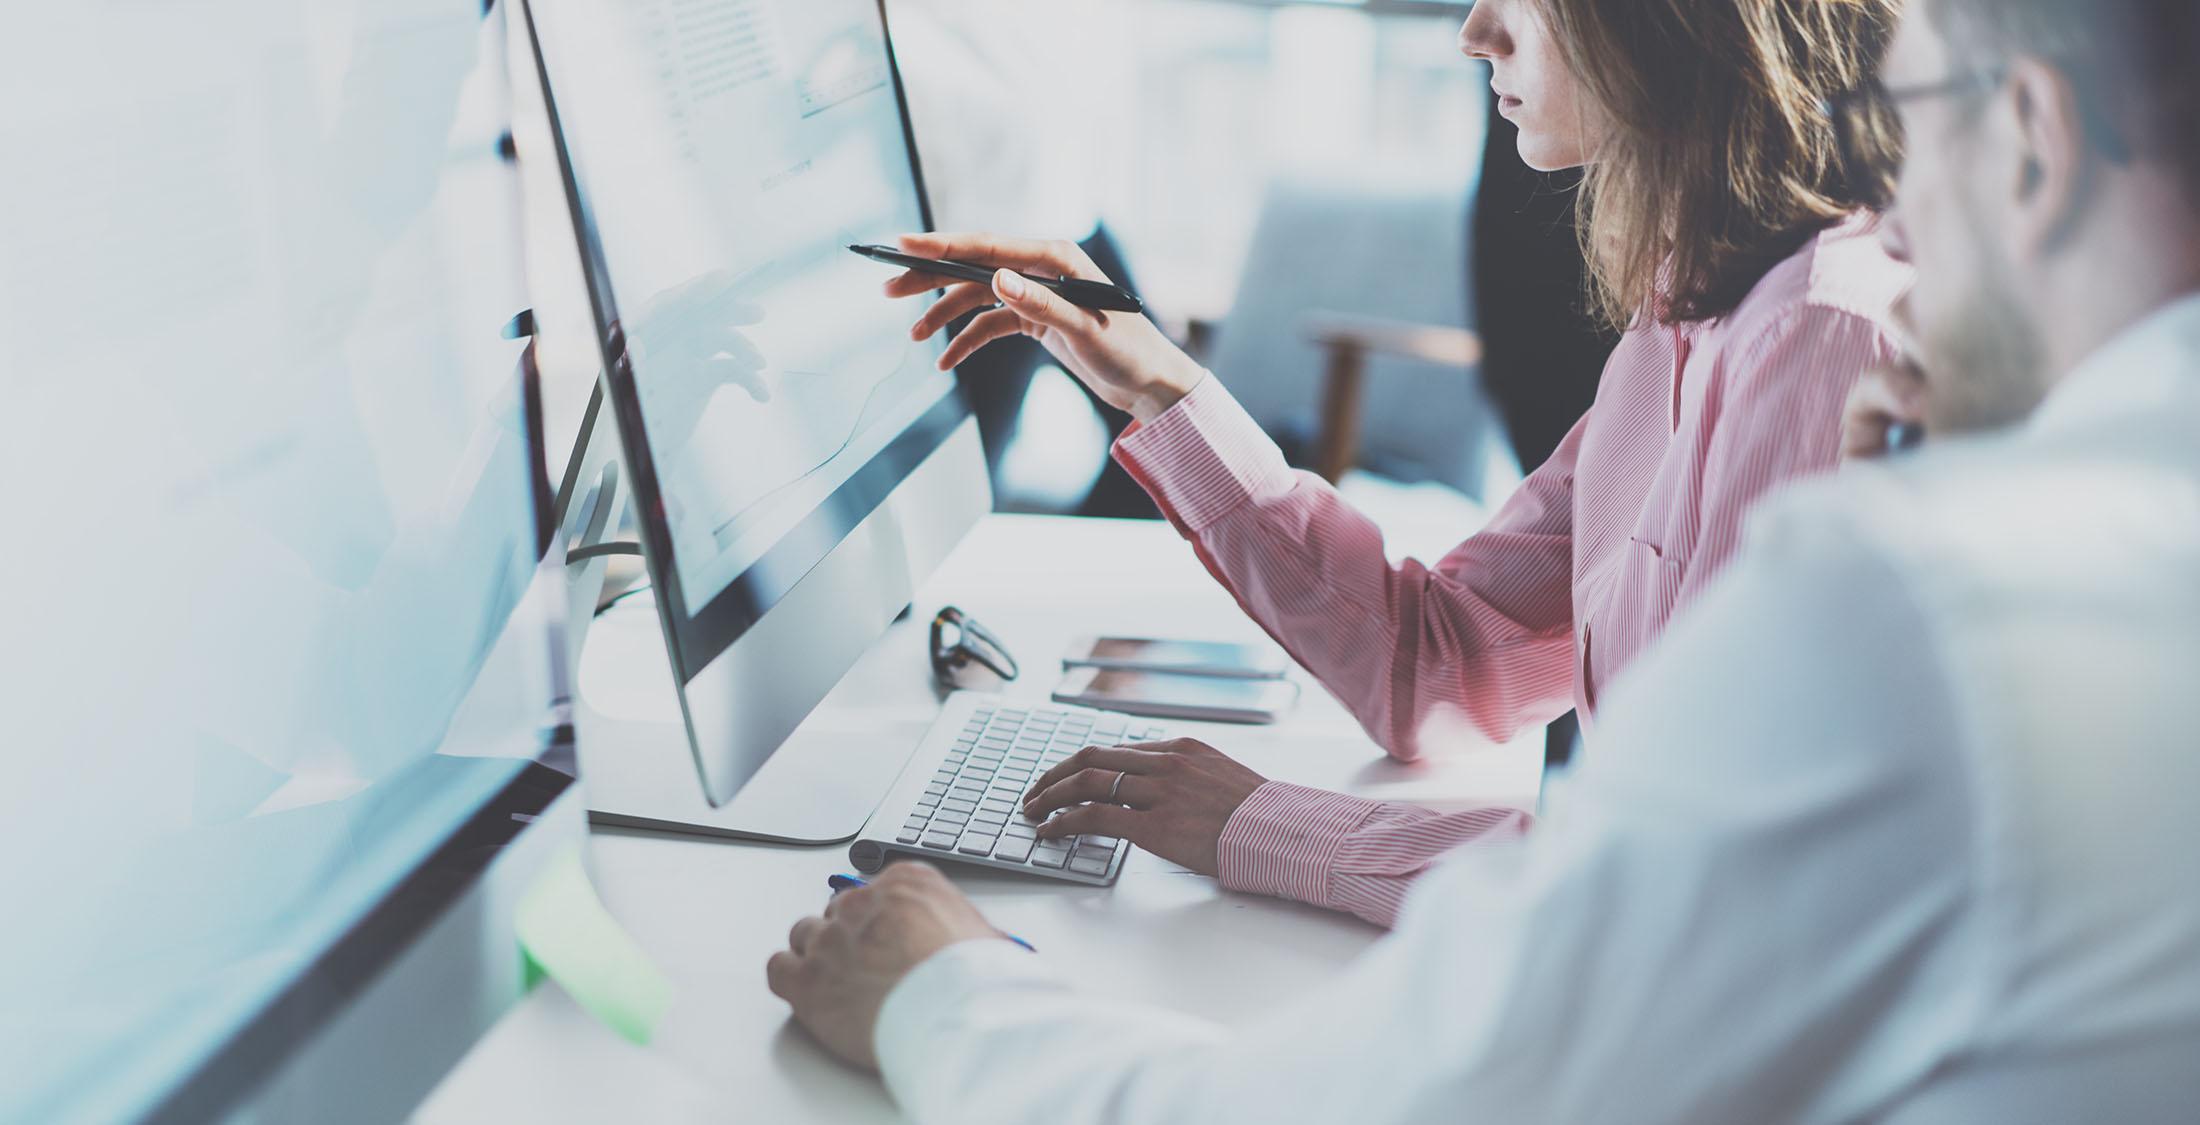 woman analyzing data on computer screen